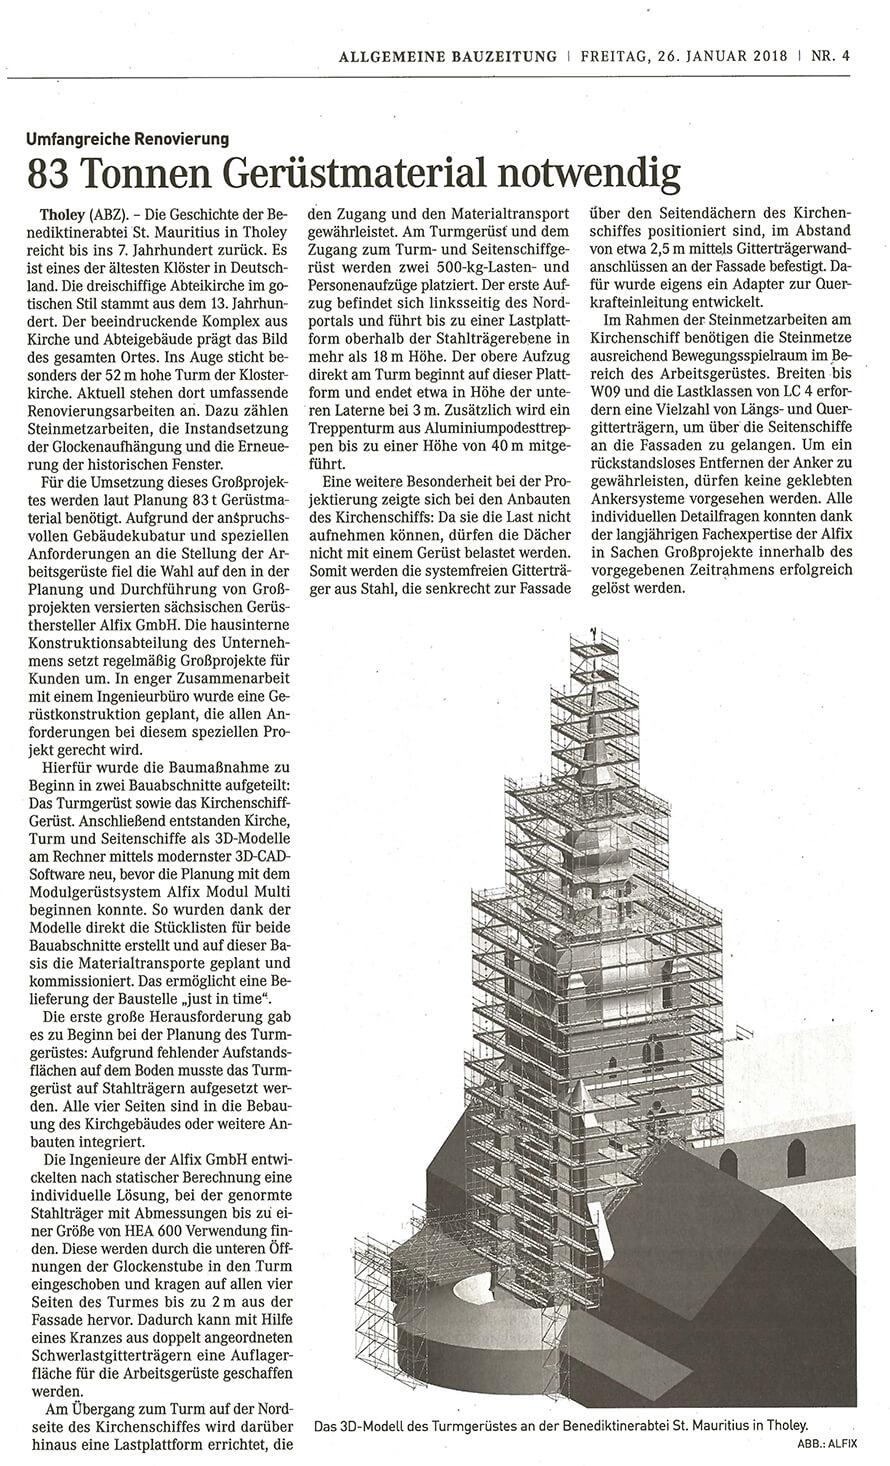 ALFIX Kirchenprojekt Tholey- Zeitungsartikel